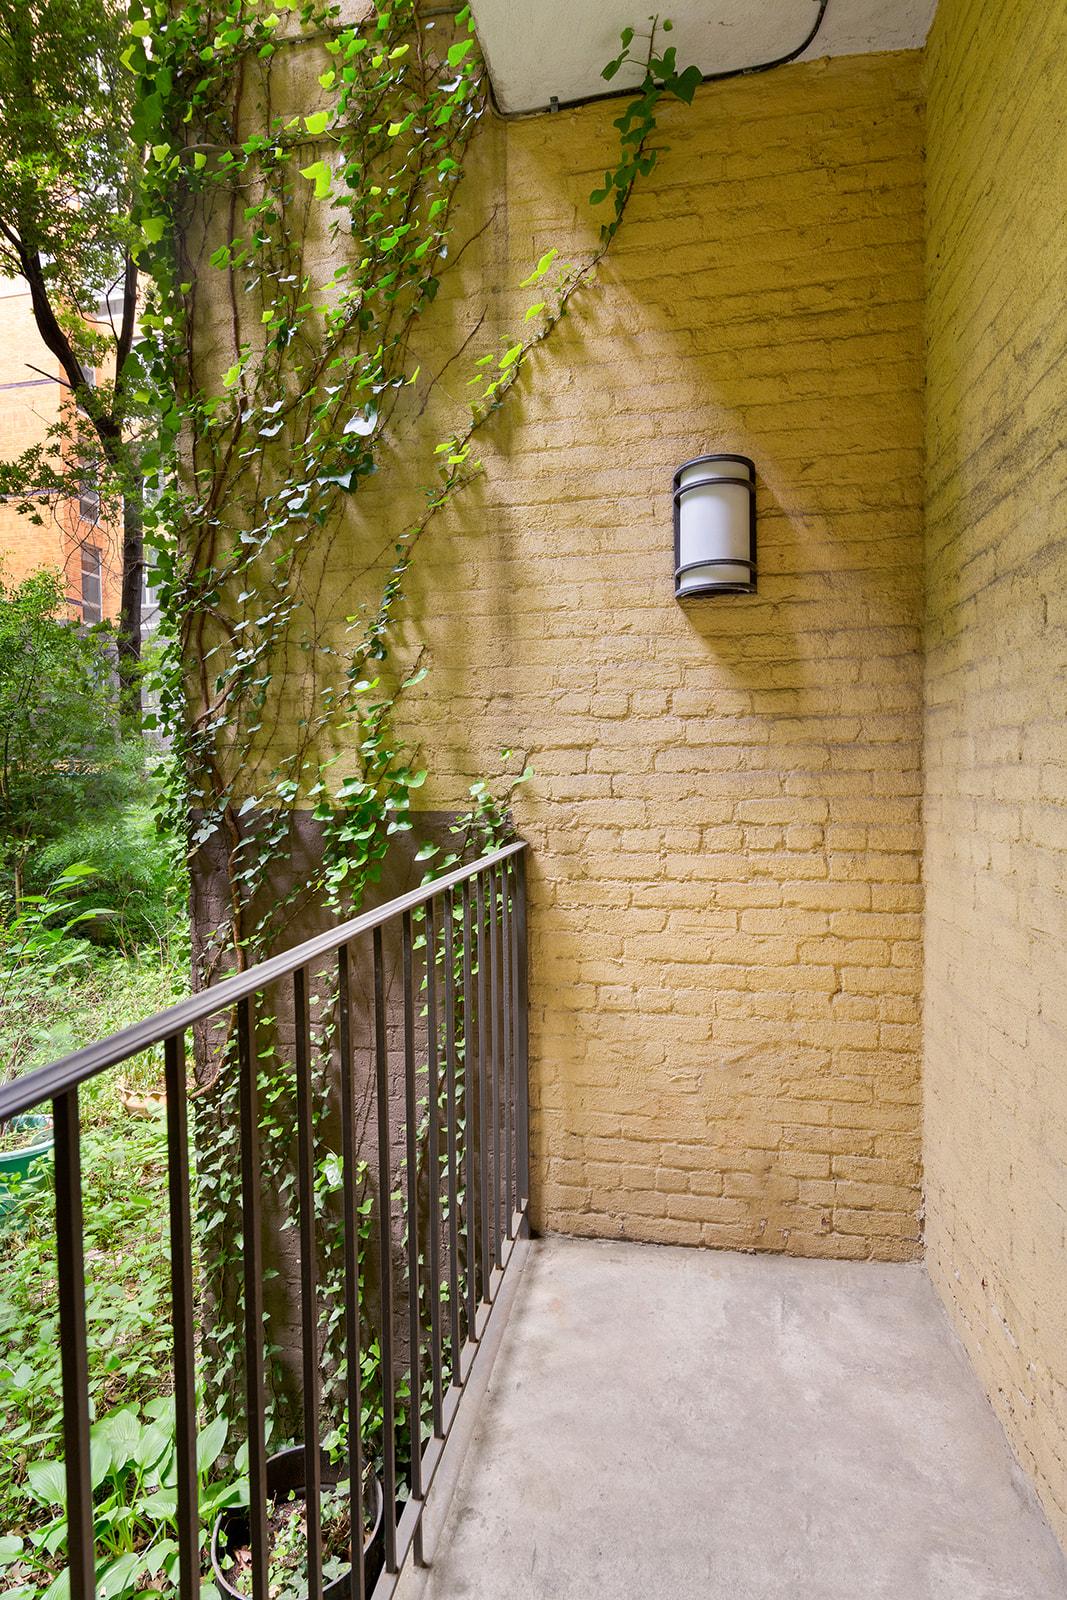 307 West 126th Street West Harlem New York NY 10027